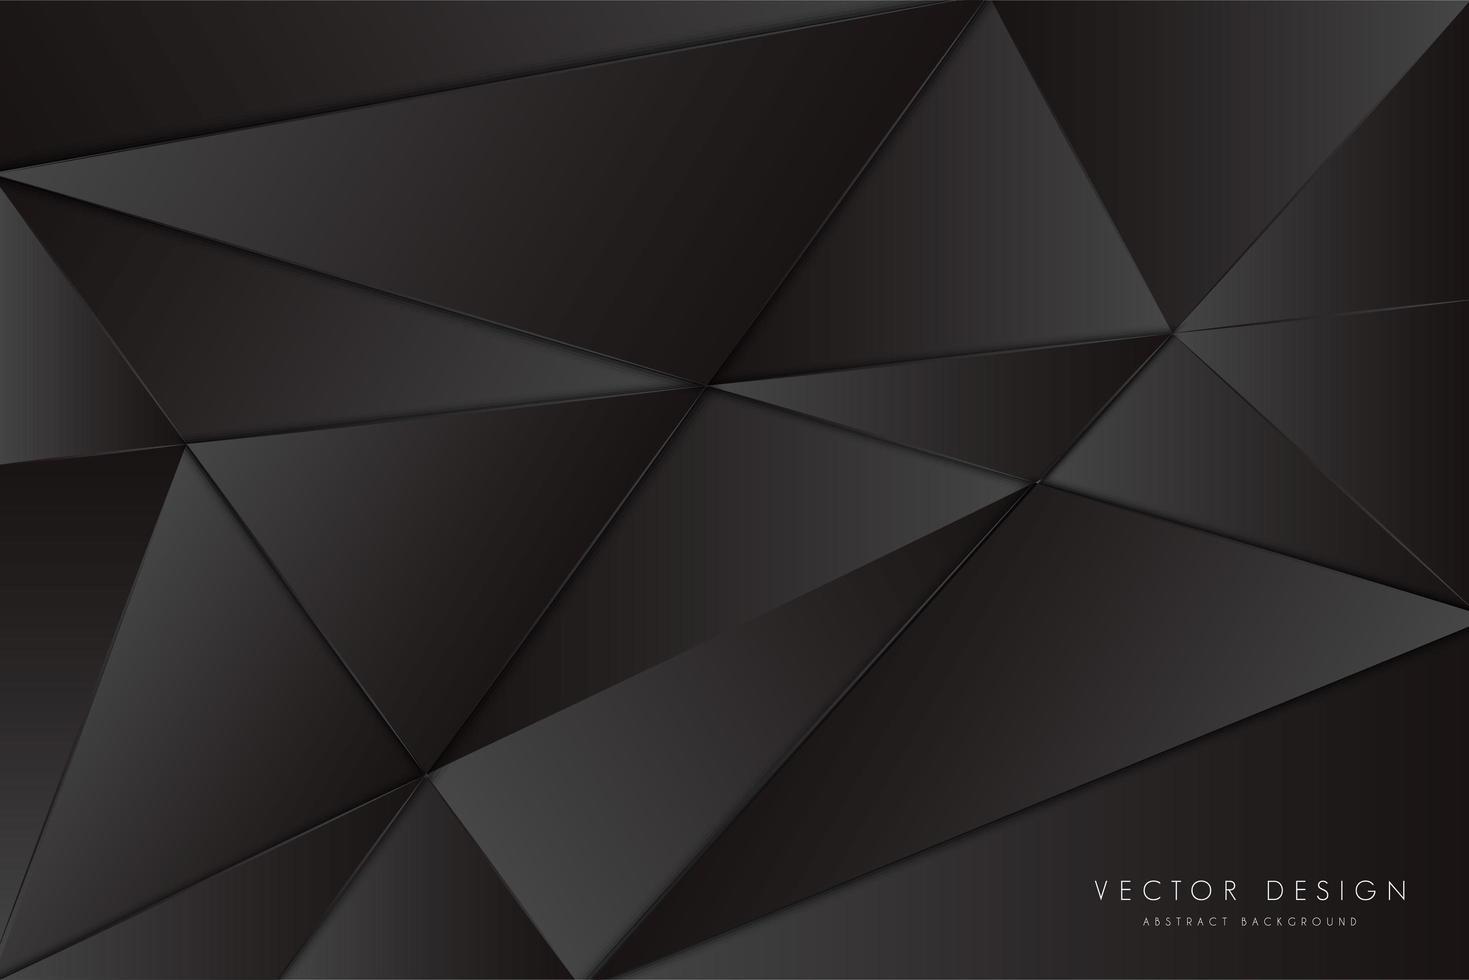 moderne donkere metalen achtergrond vector